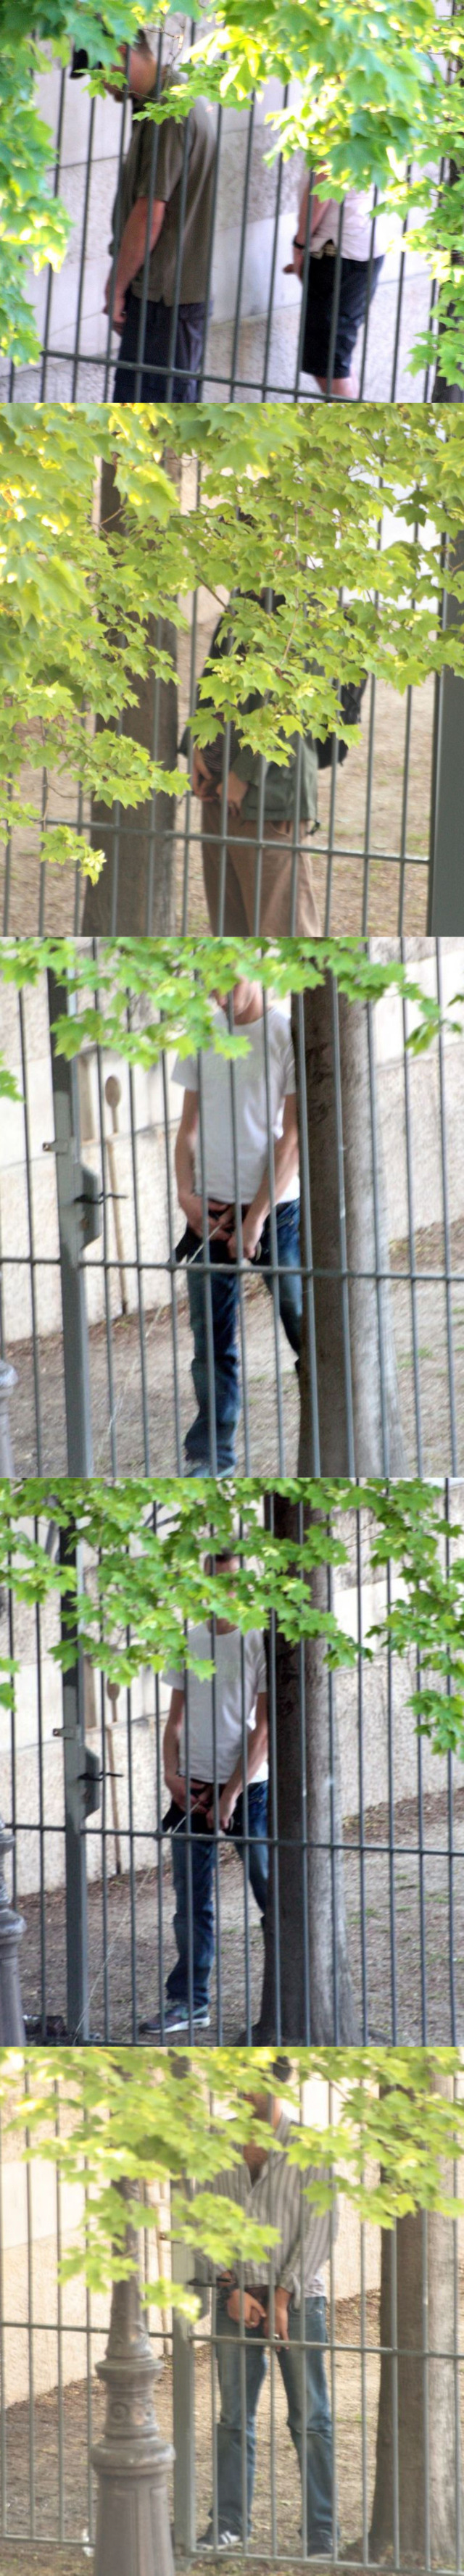 spycam pics guys caught peeing outdoor